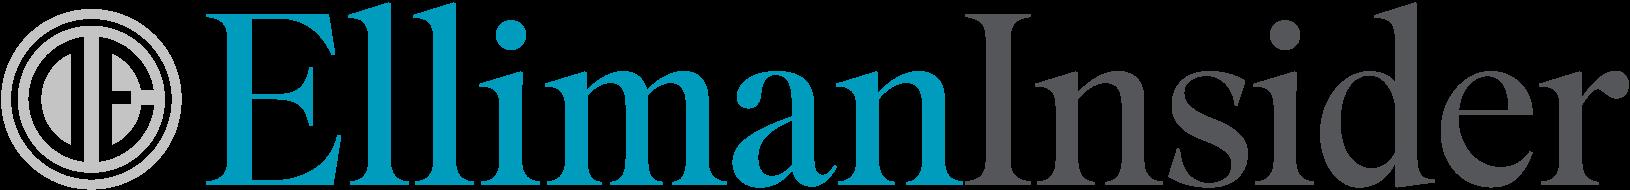 elliman_insider_logo